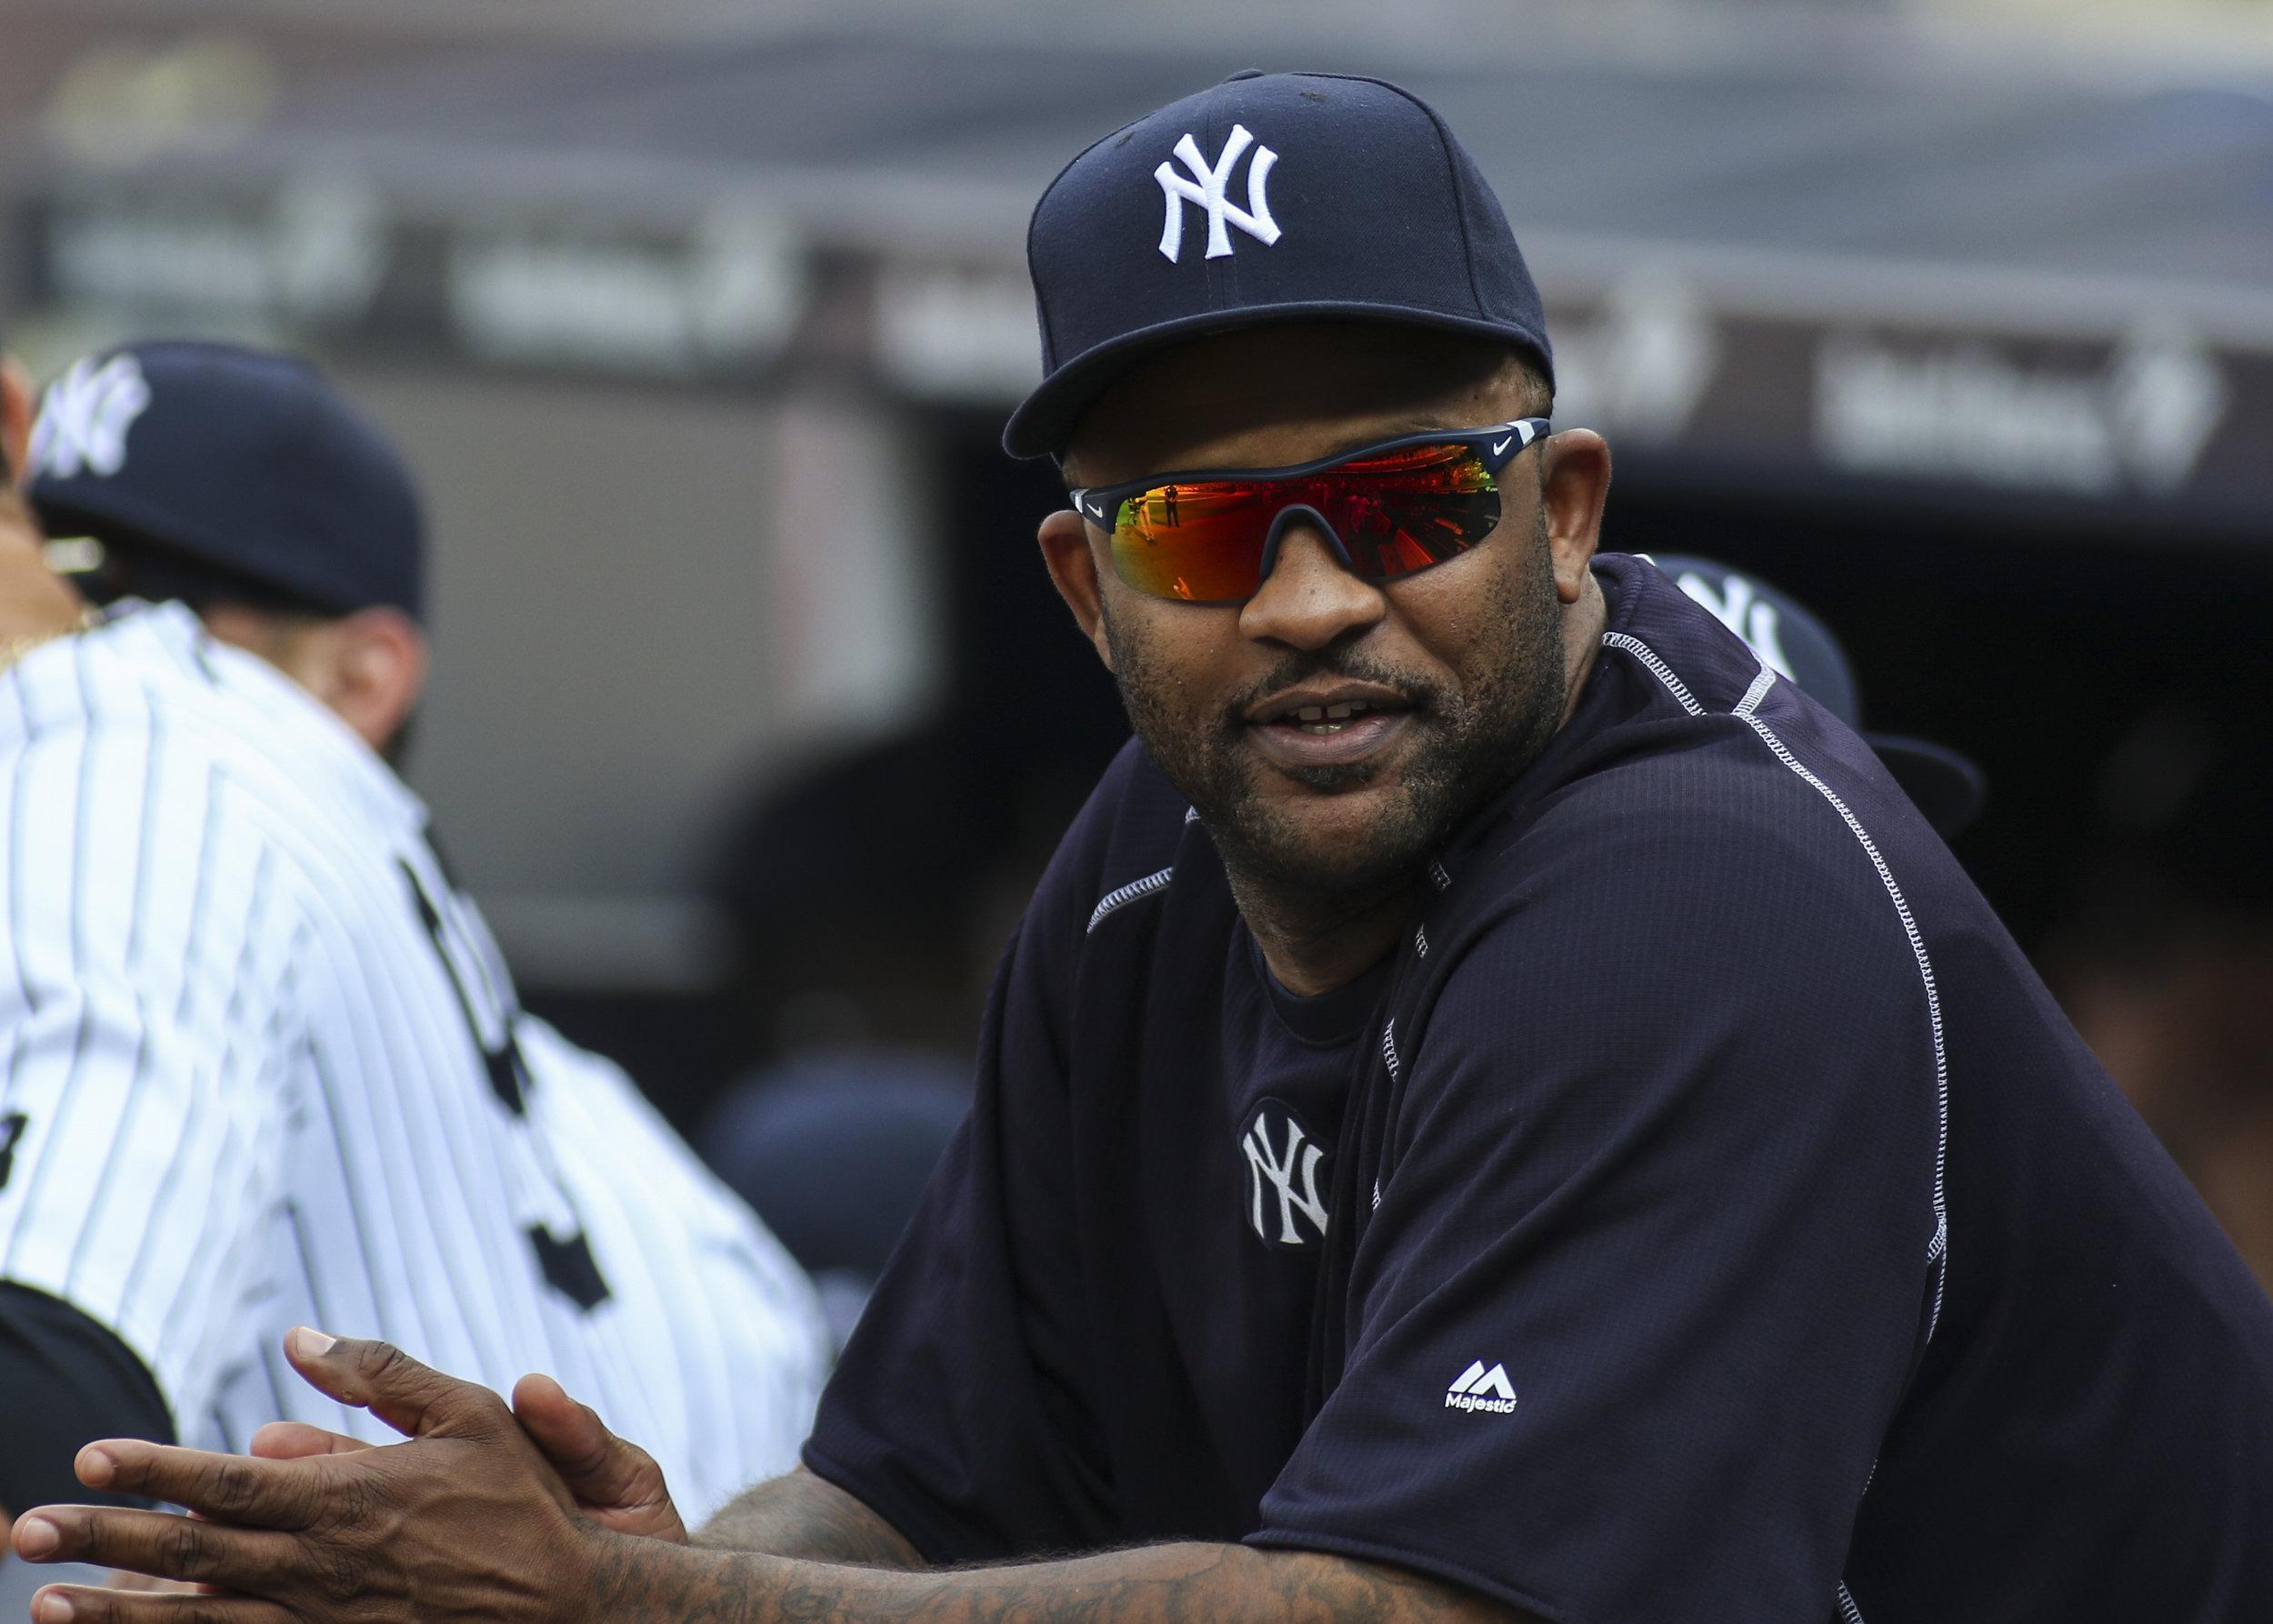 New York Yankees pitcher C.C. Sabathia.